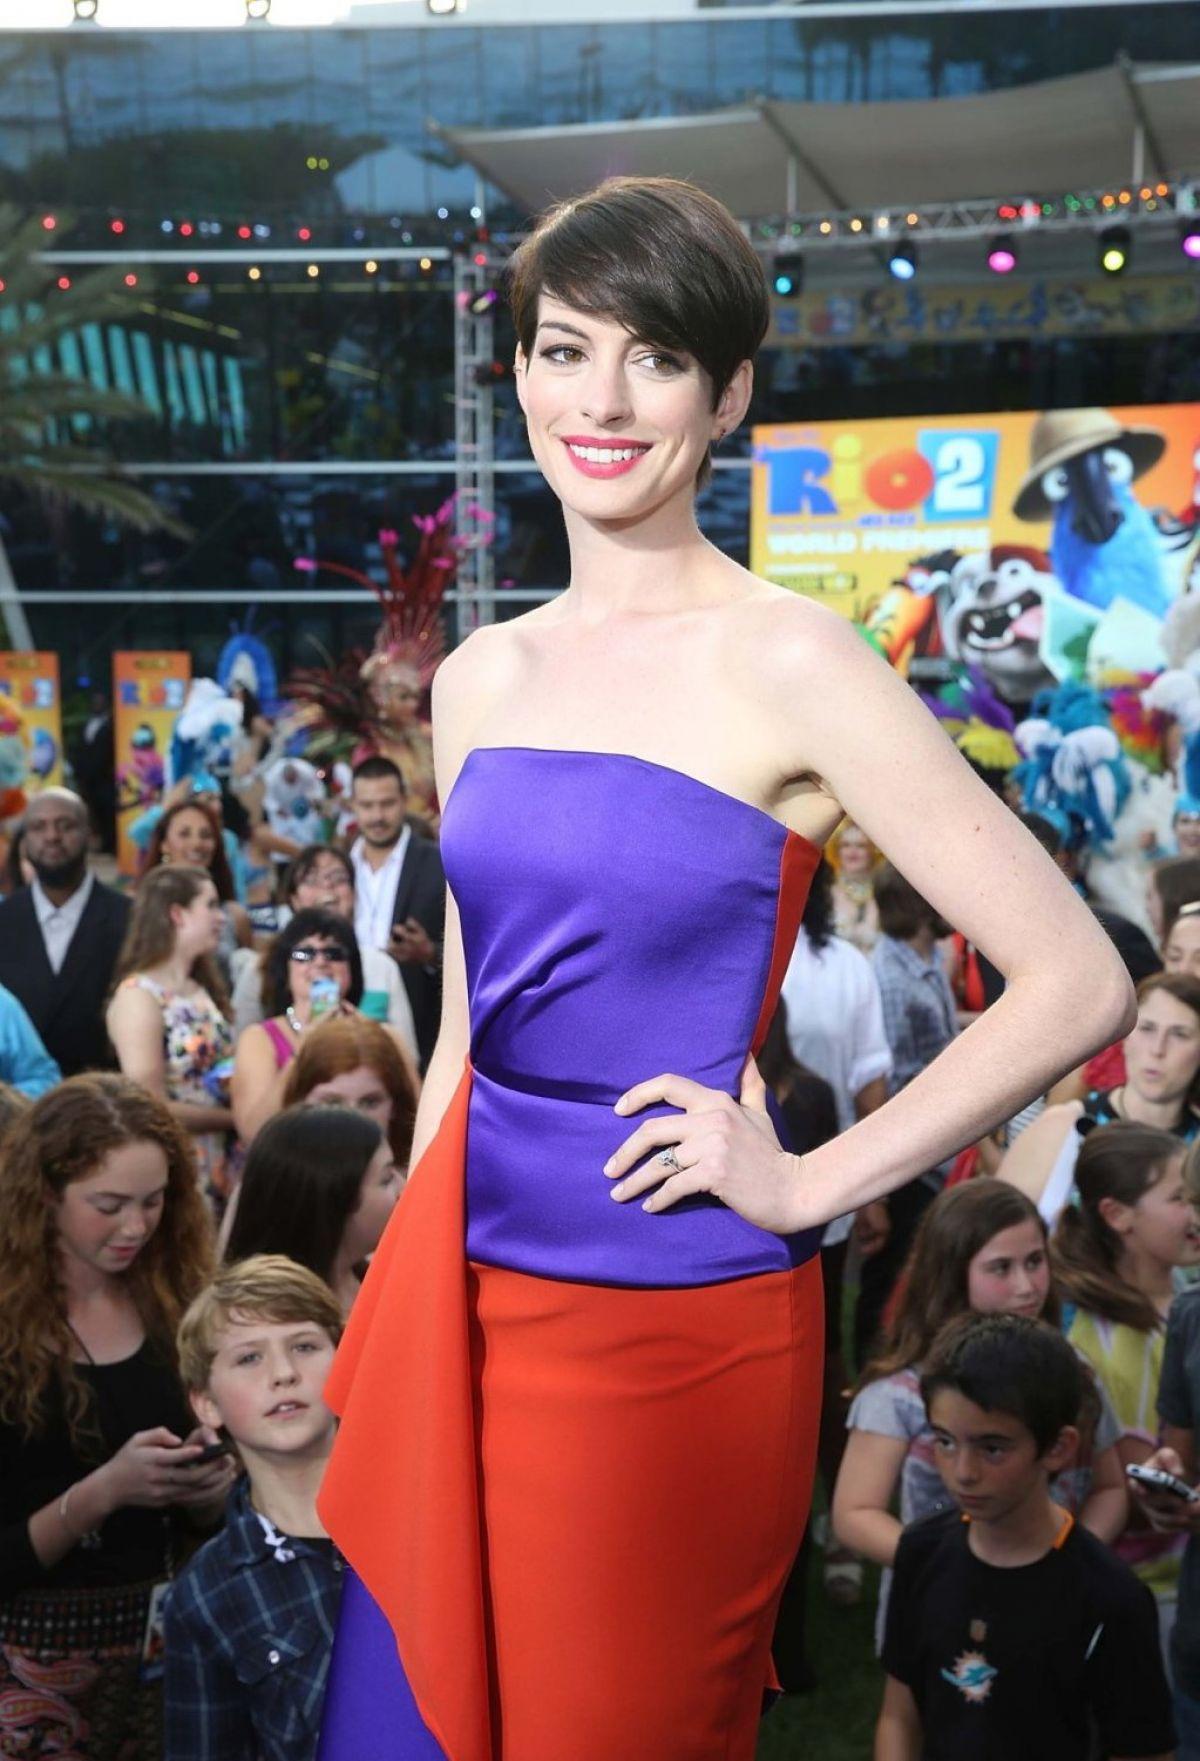 Anne Hathaway At Rio 2 Premiere In Miami Beach